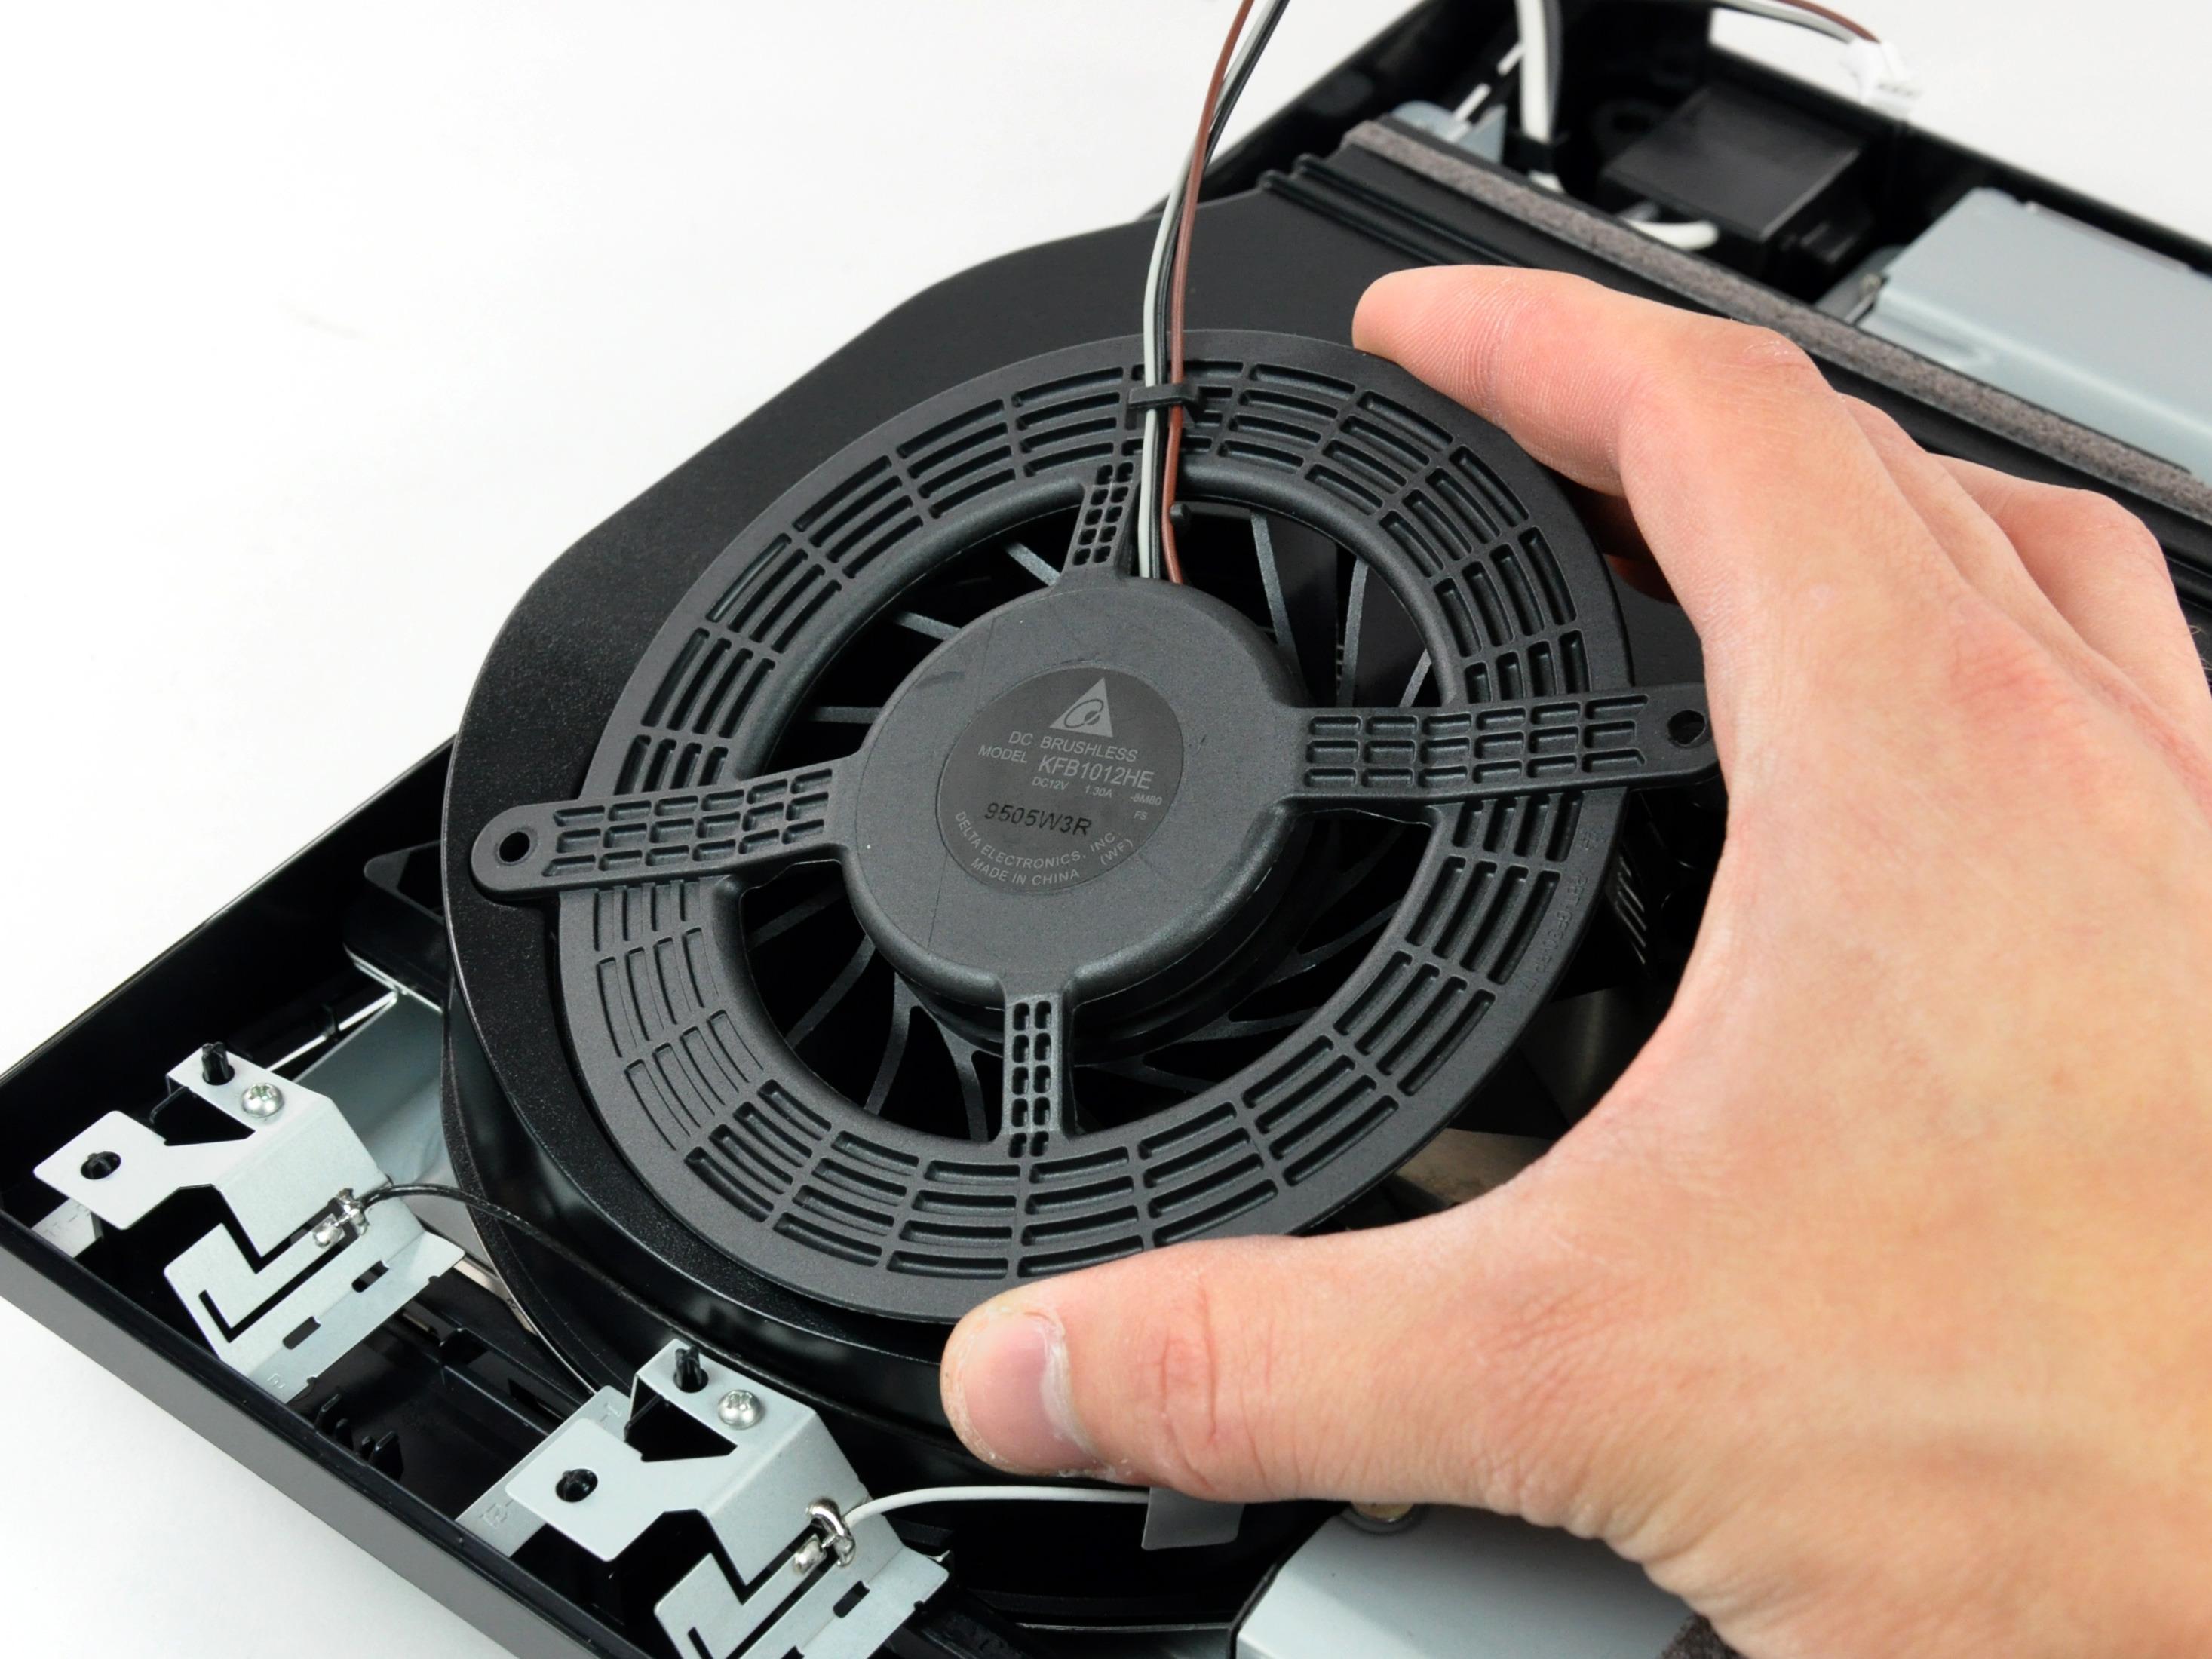 Playstation 3 Slim Repair Ifixit Sony Super 320 Gb Fan